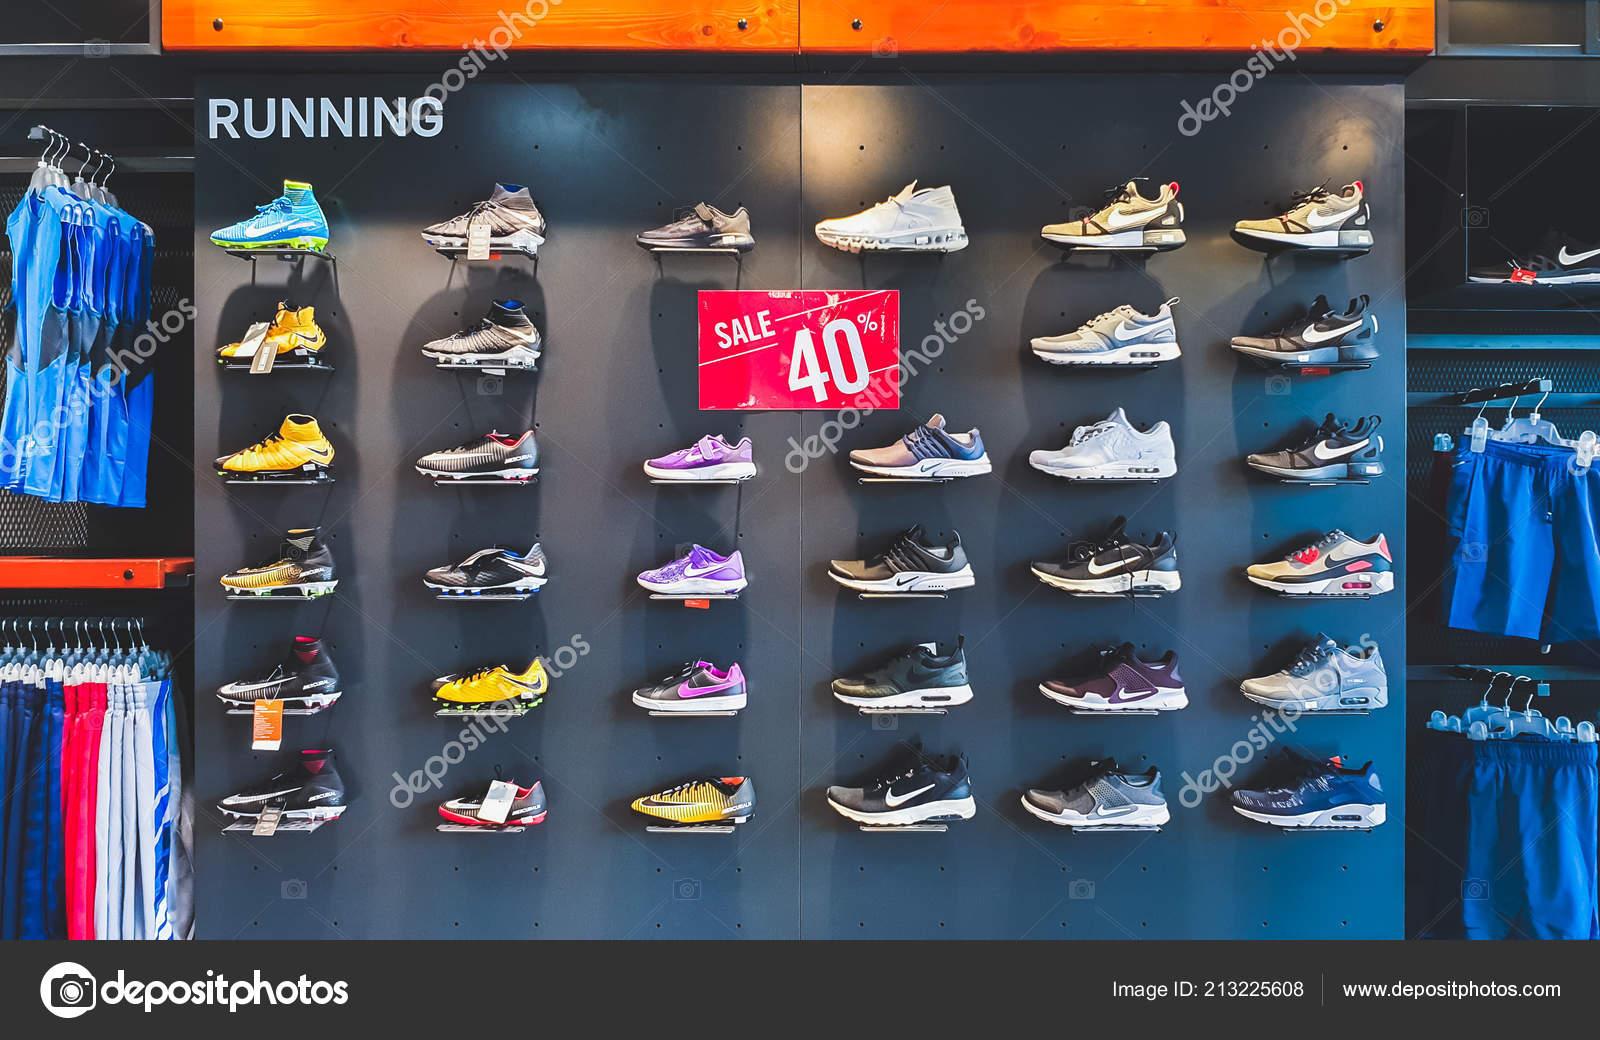 9fb278ddda Bangkok Tailândia Setembro 2018 Nike Tênis Roupas Prateleira ...